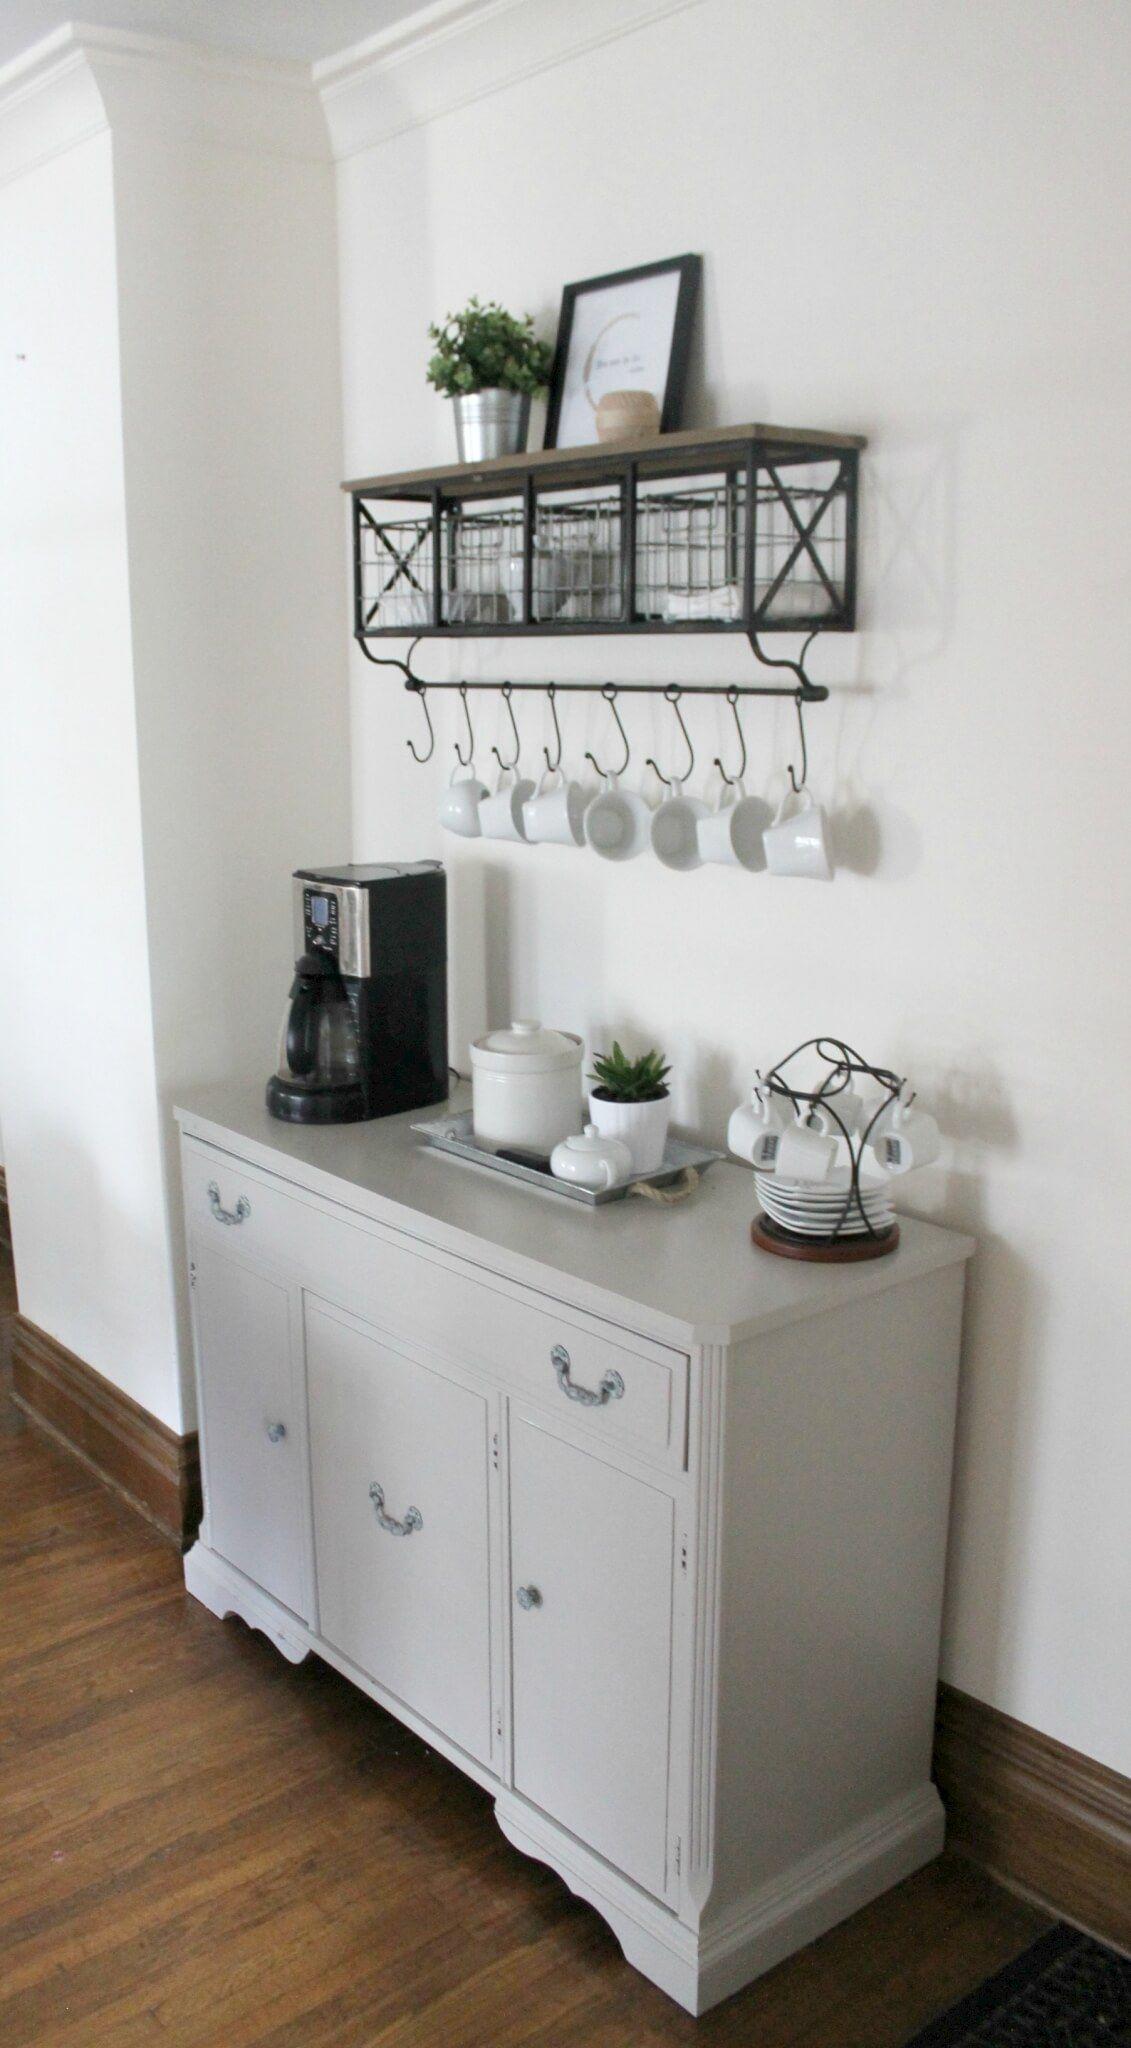 DIY Coffee Bar in Gray (With images) Diy coffee bar